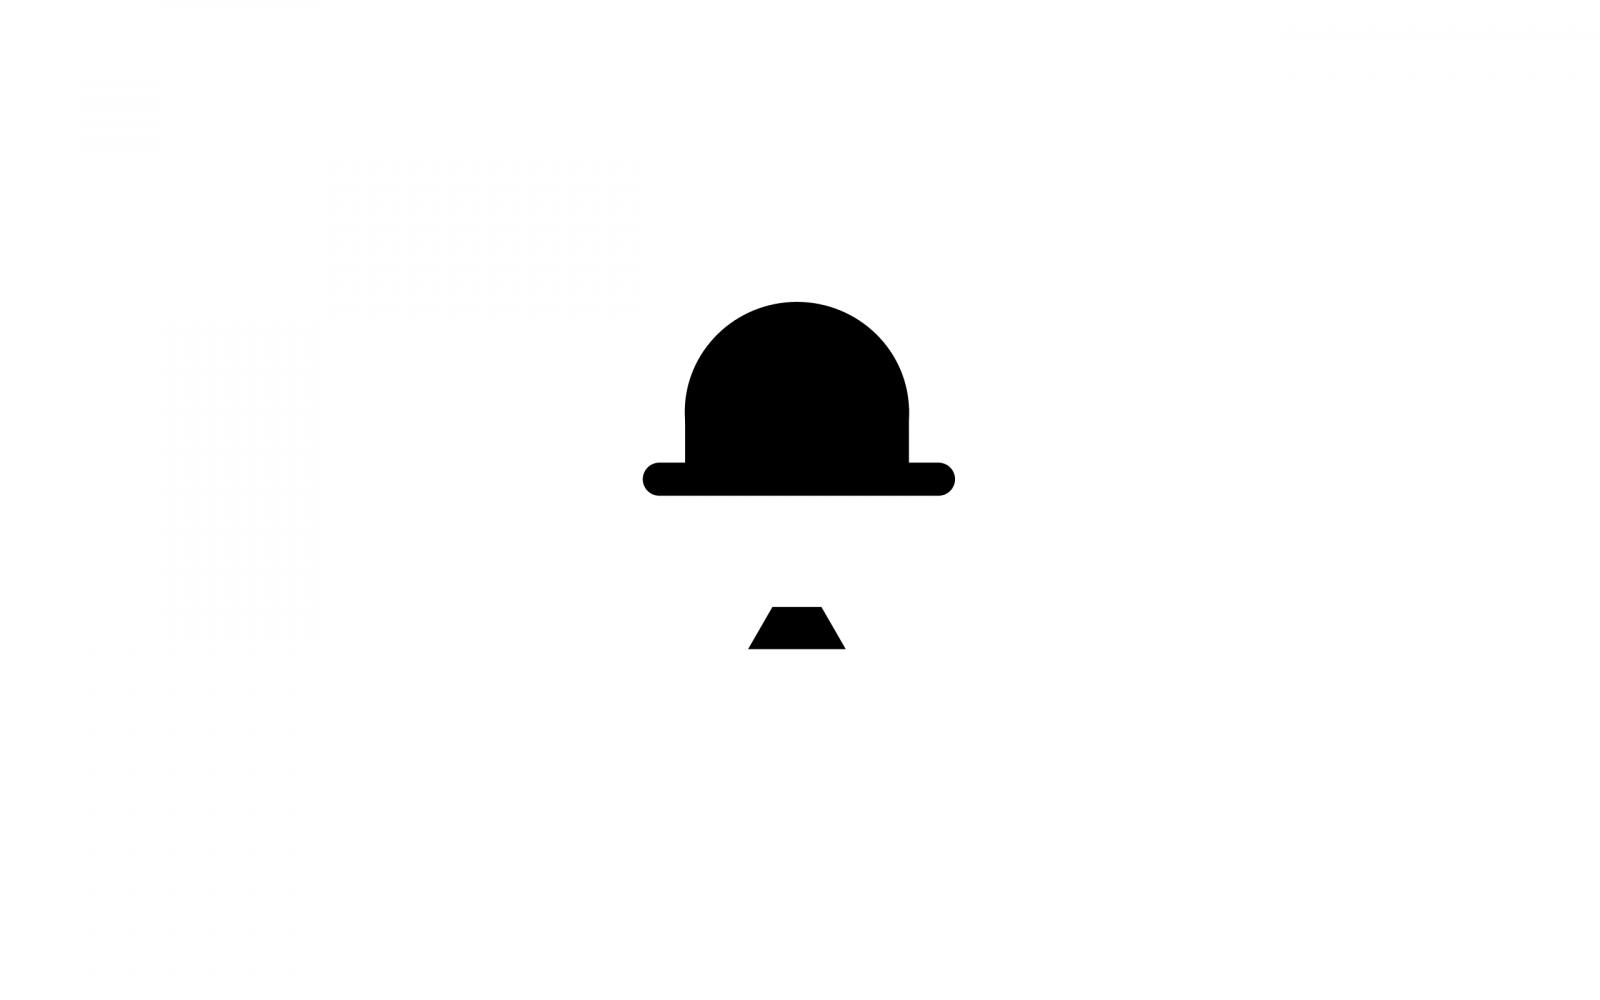 шляпа чарли чаплина картинка мелкие детали